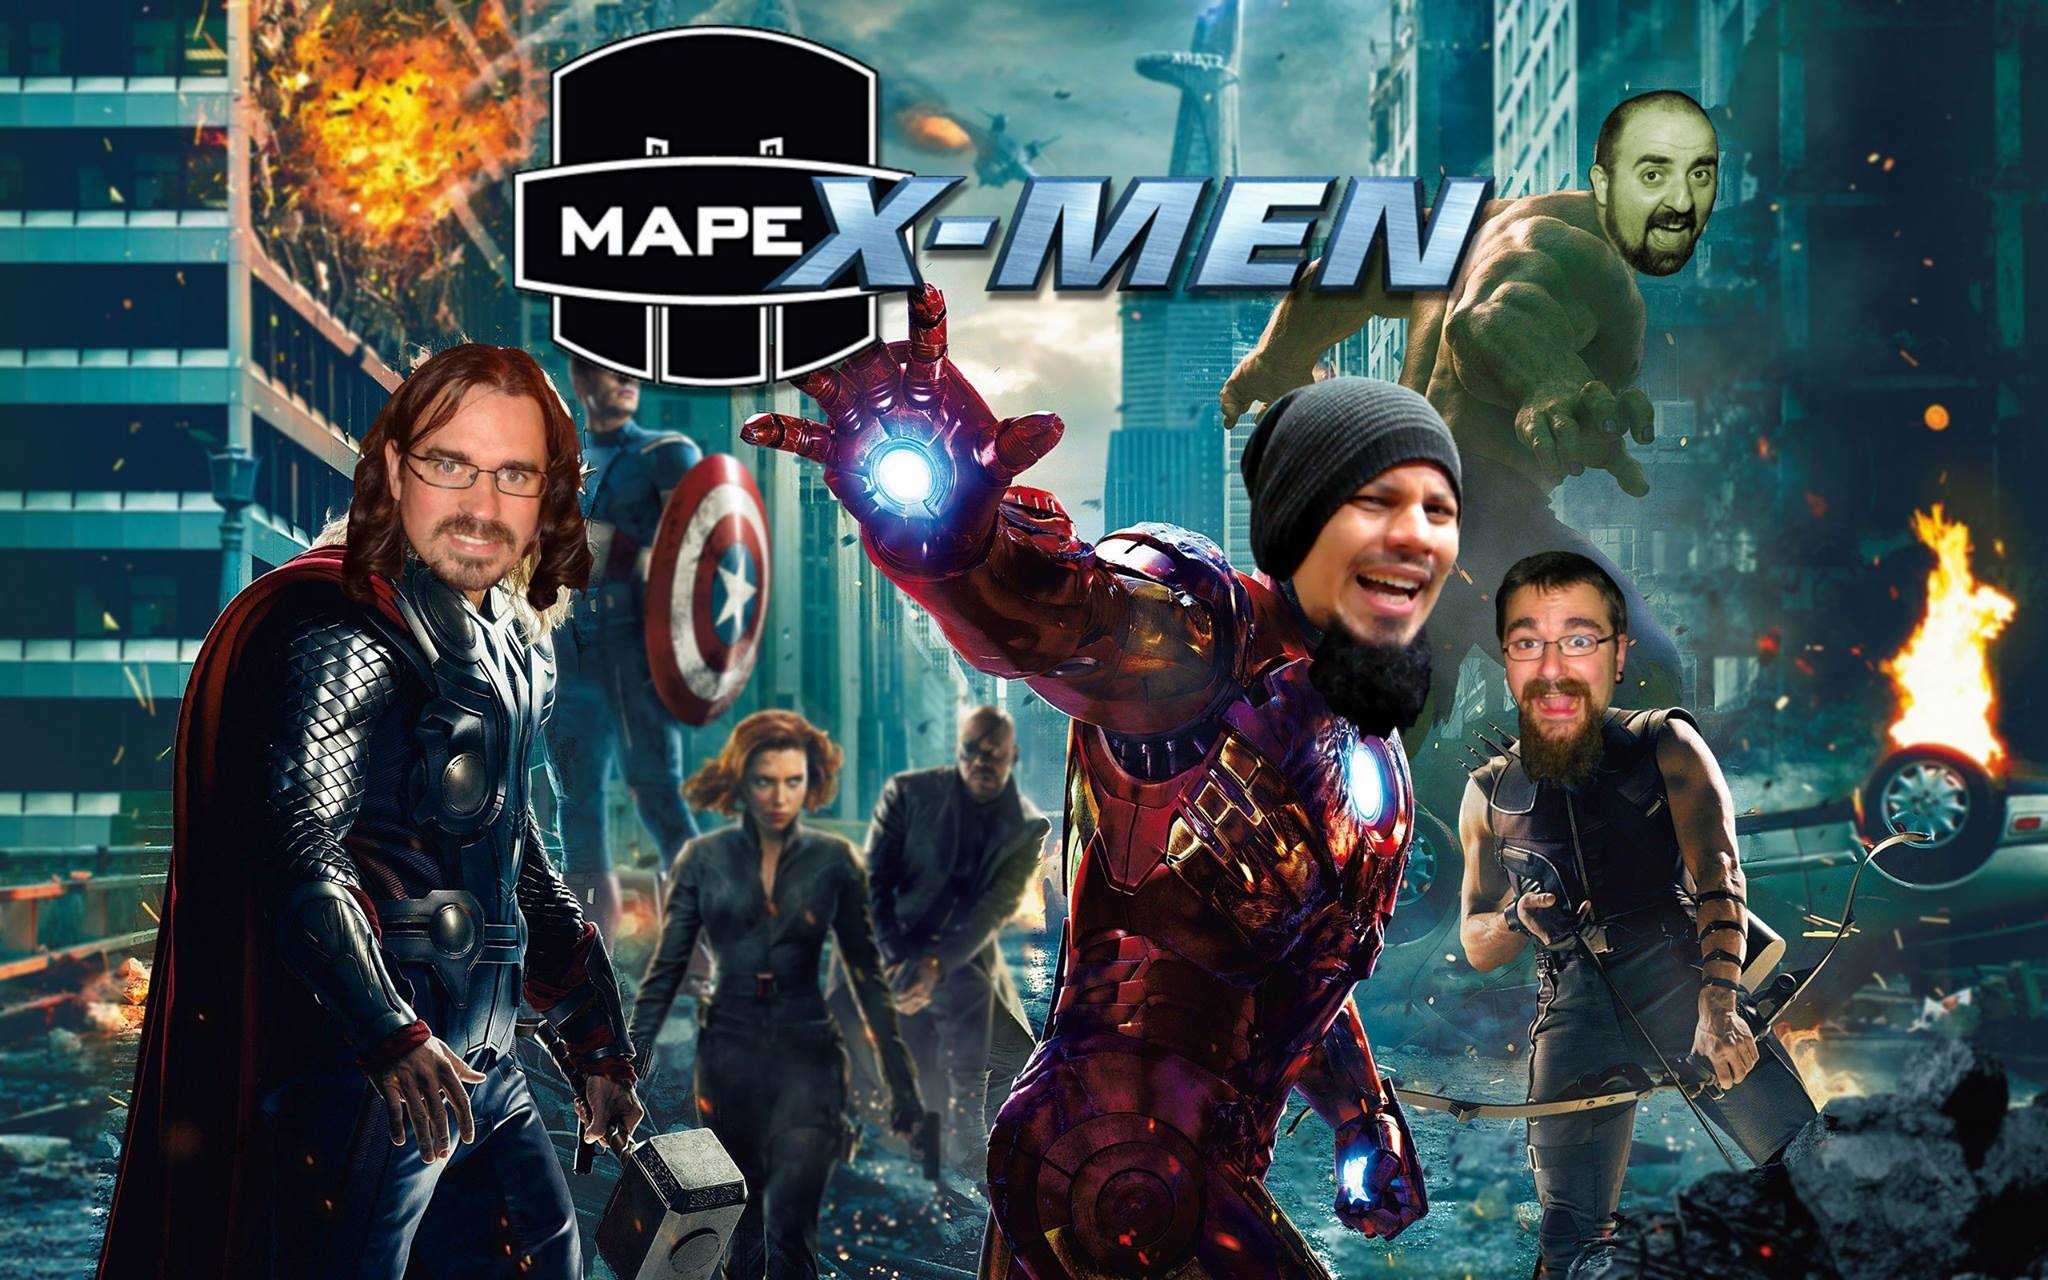 Mapex men 08.jpg